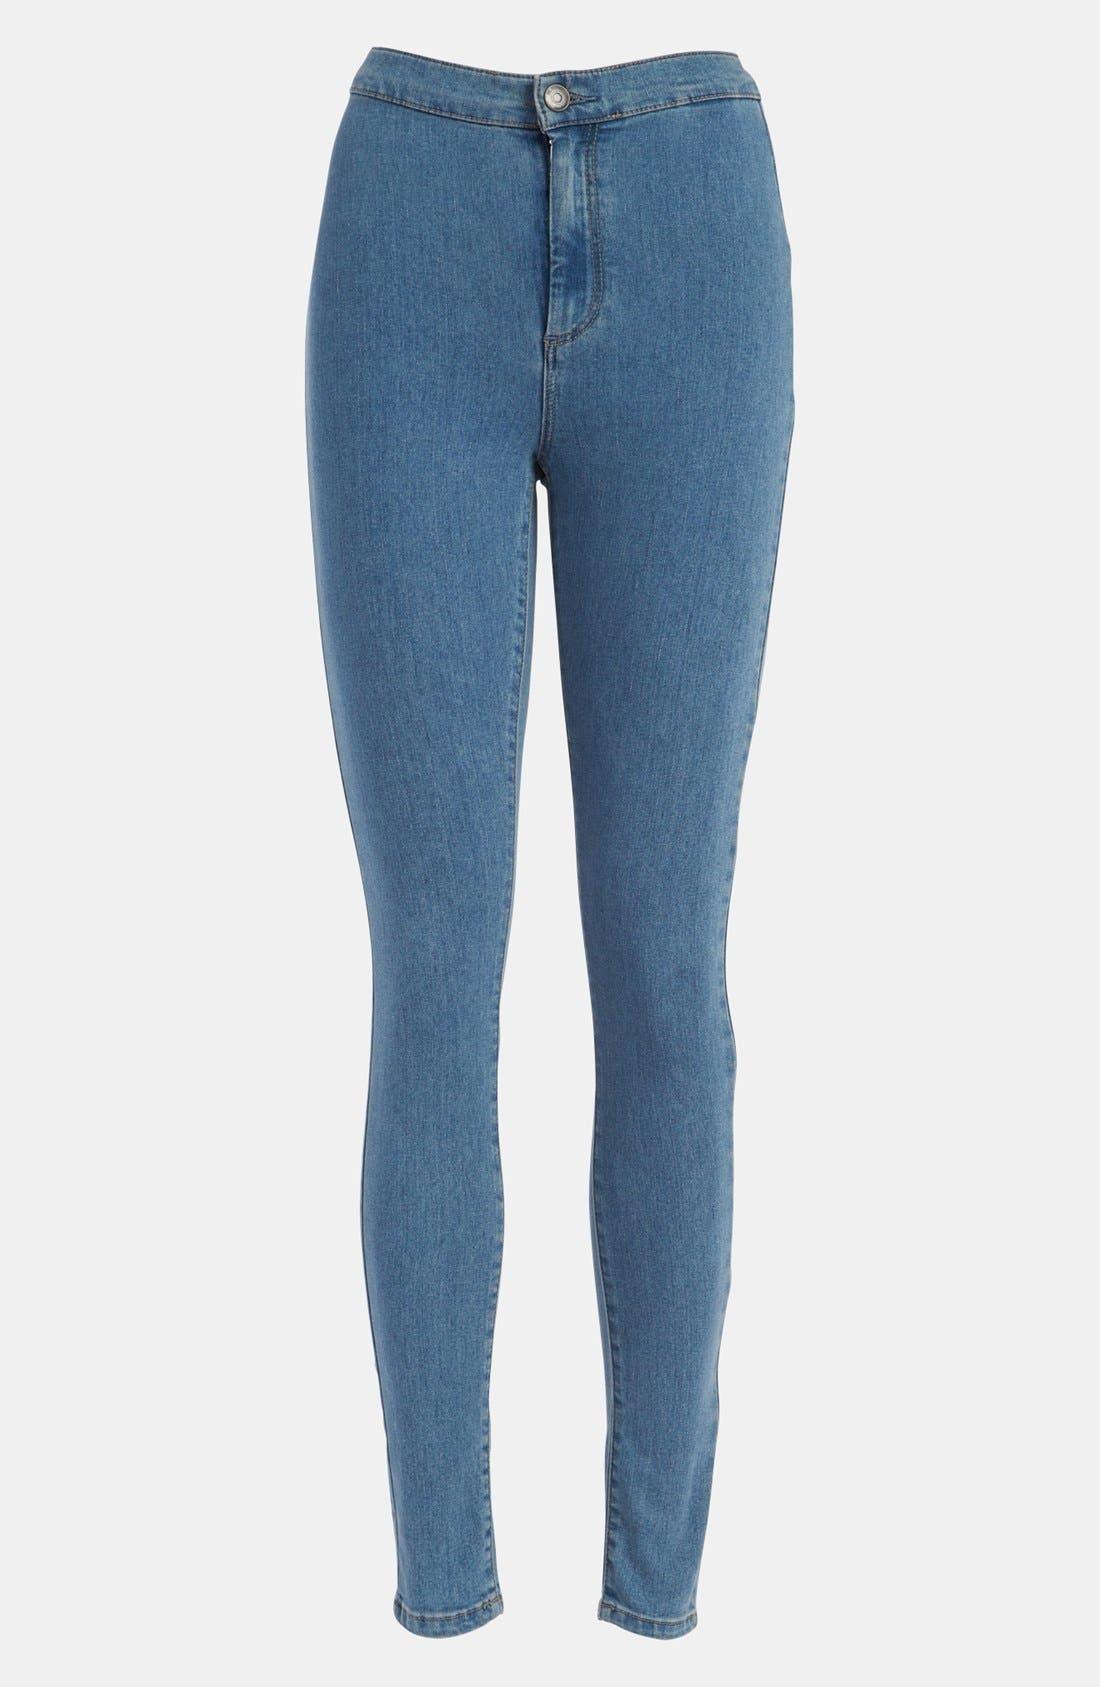 Main Image - Topshop Moto 'Joni Disco' High Waisted Jeans